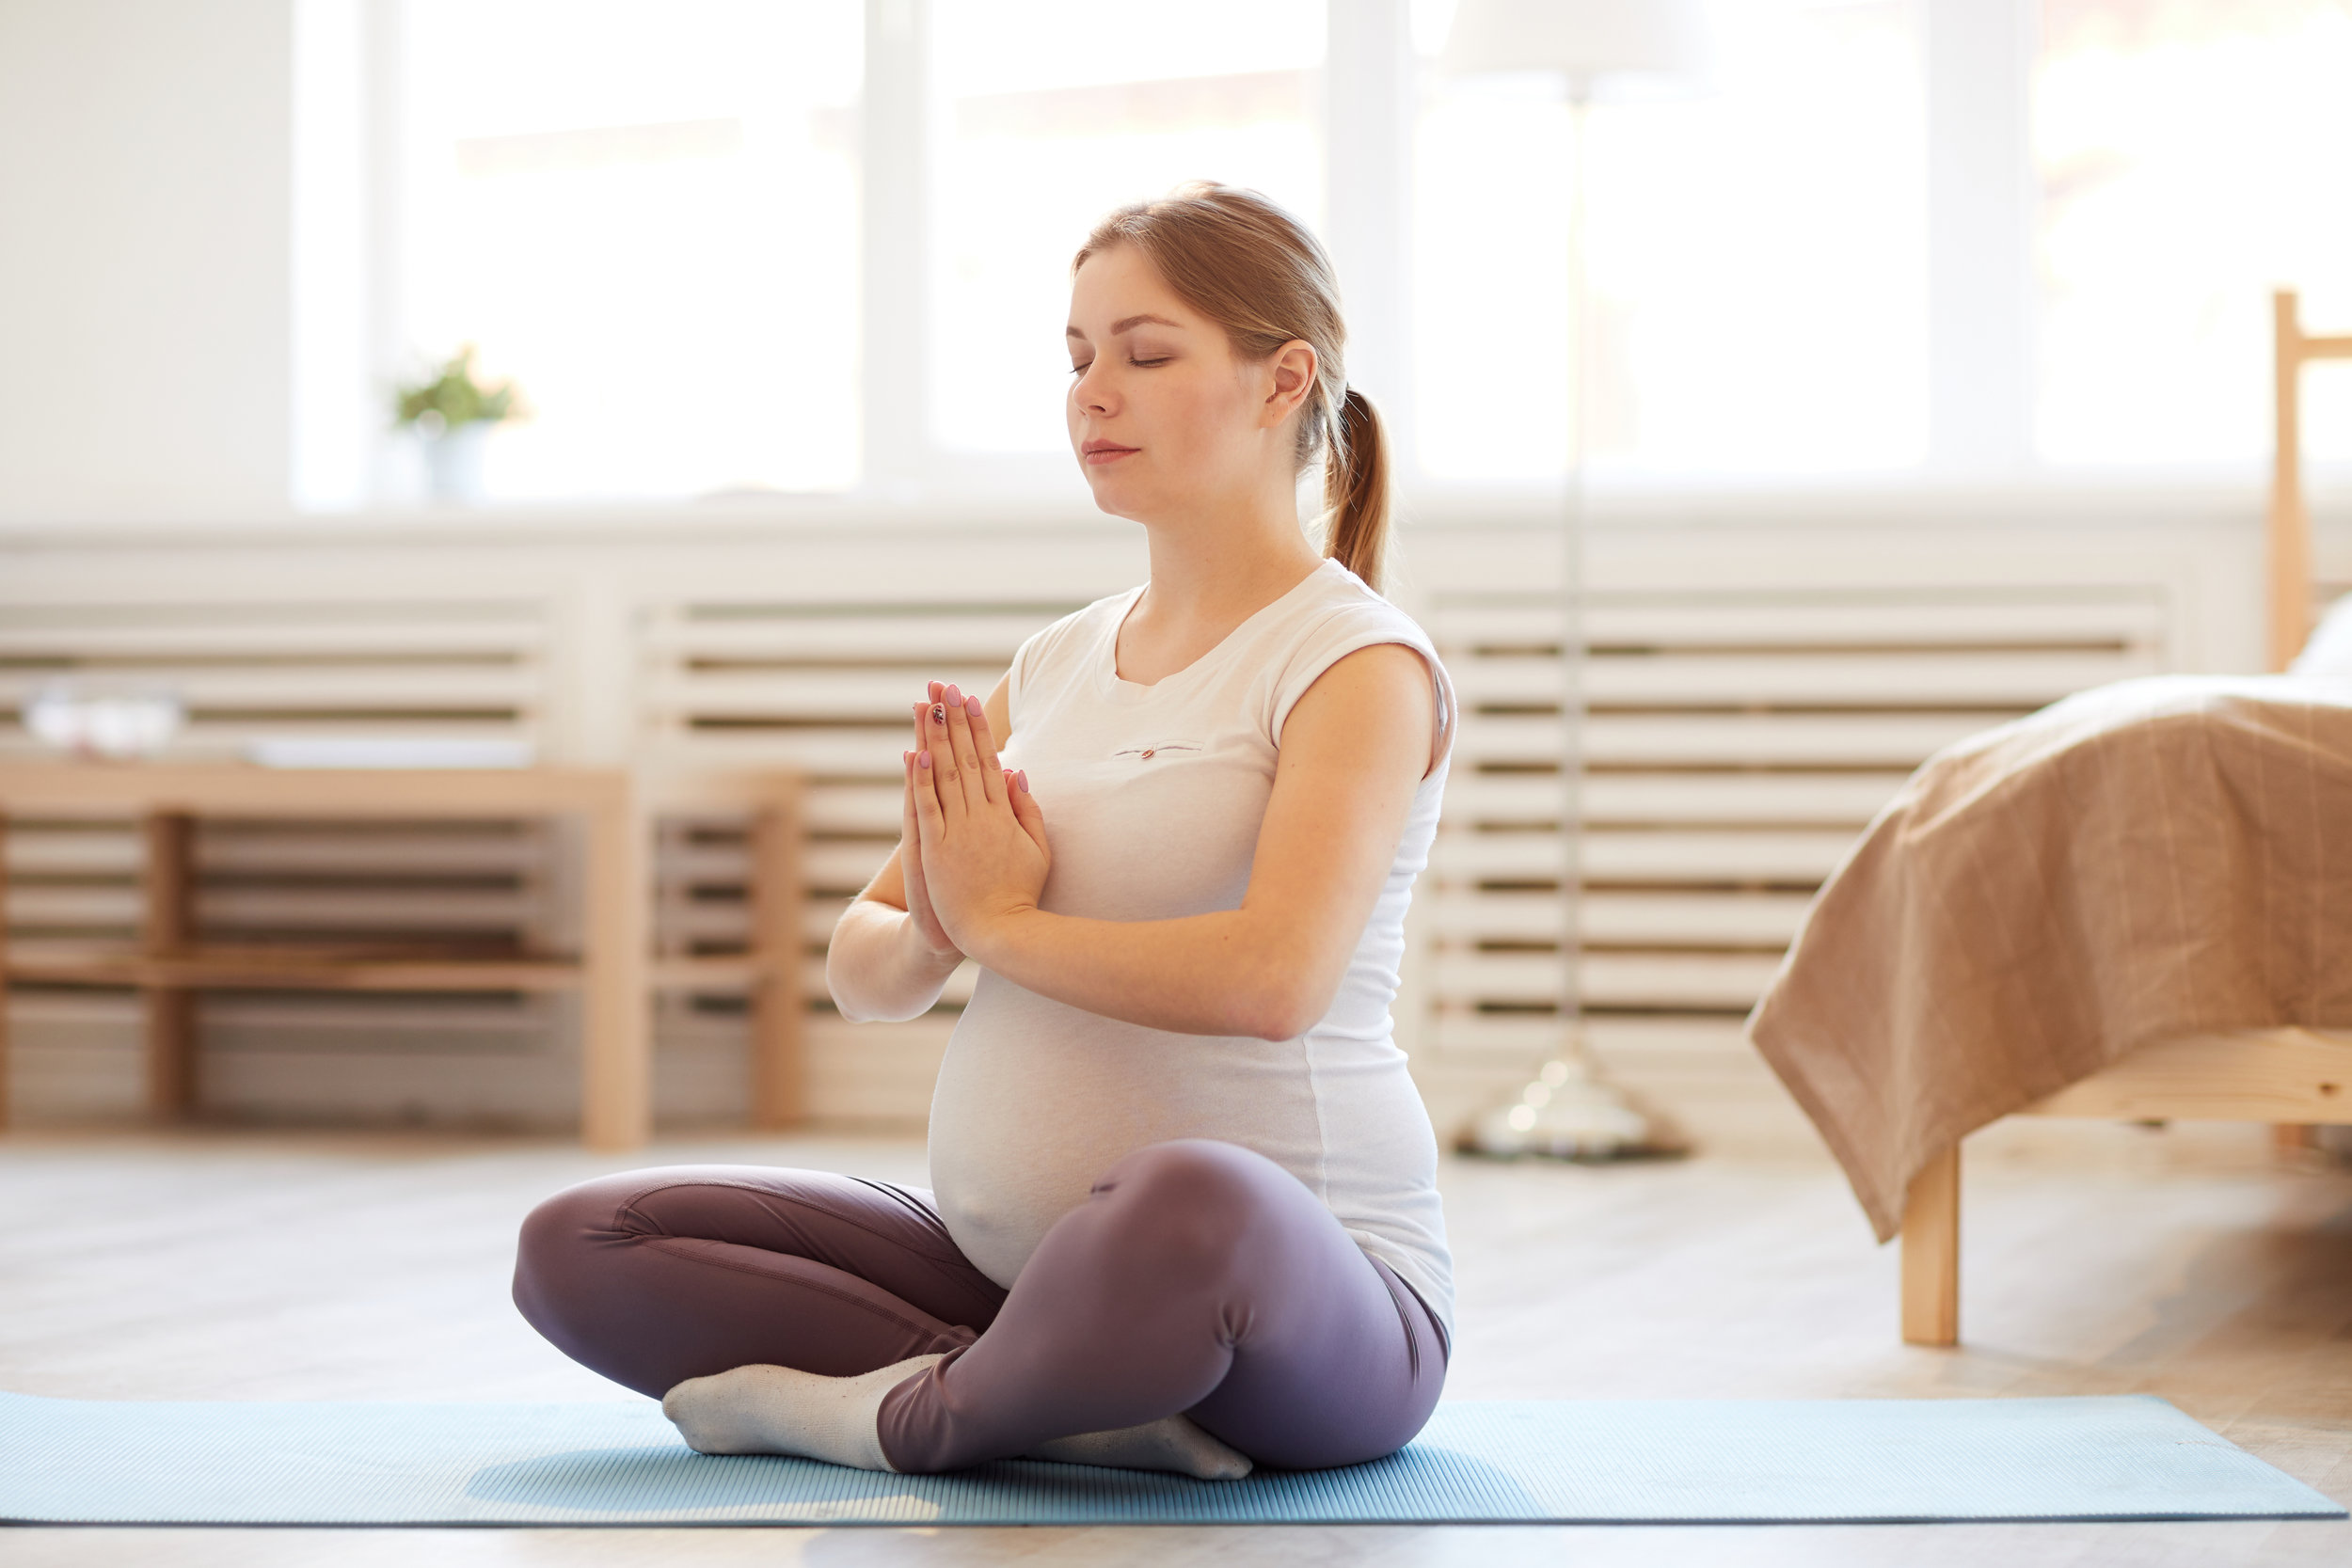 pregnant-woman-meditating-AP7ZUDL.jpg